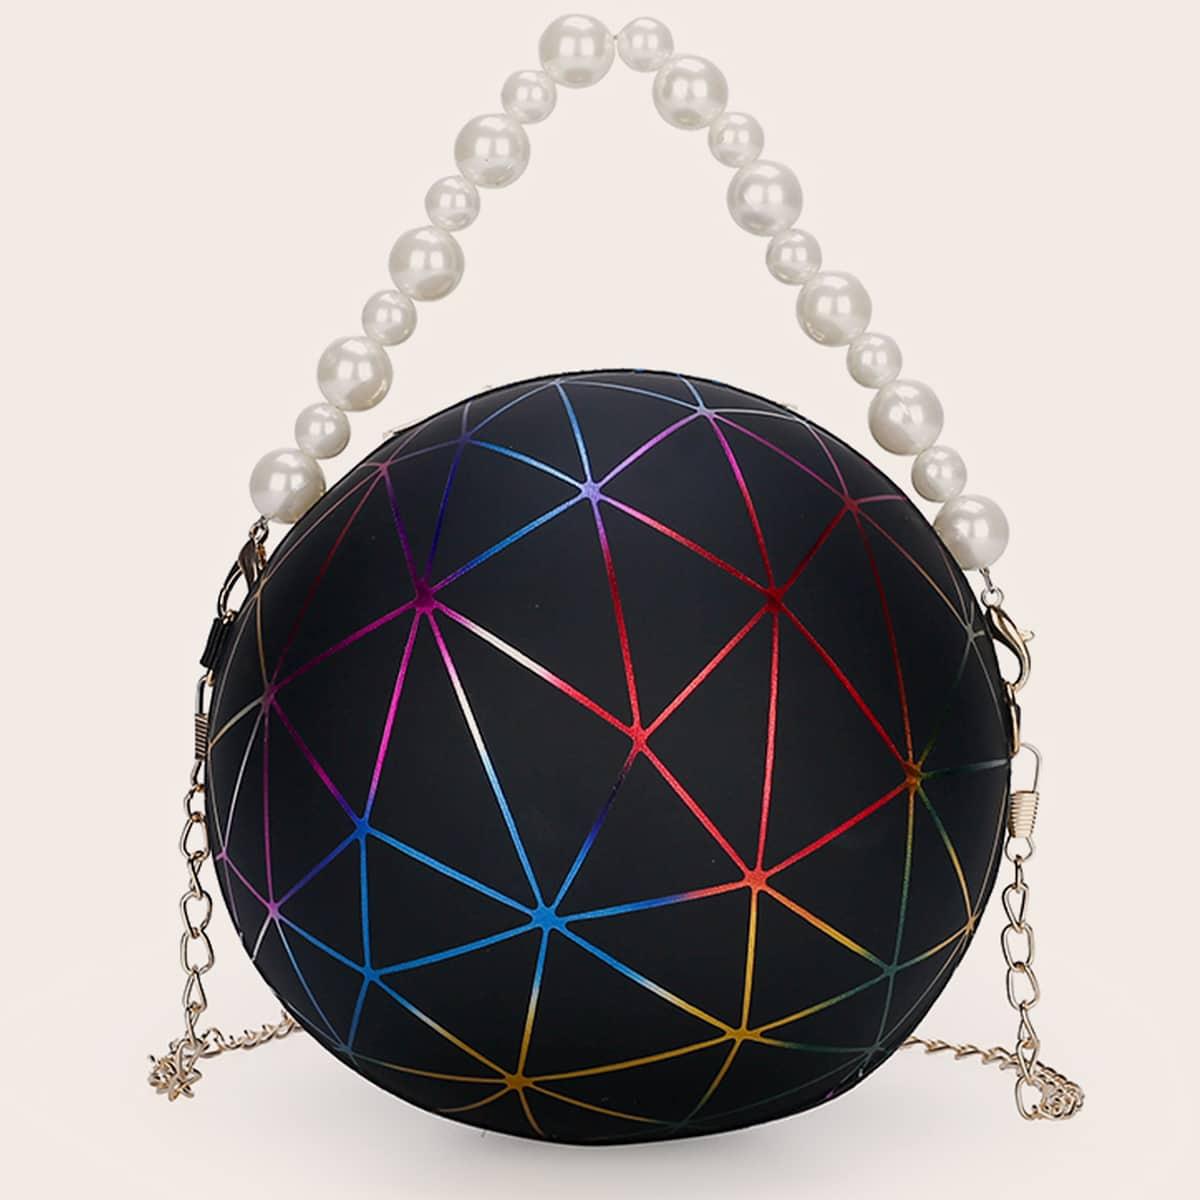 SHEIN / Geometric Pattern Ball Shaped Satchel Bag